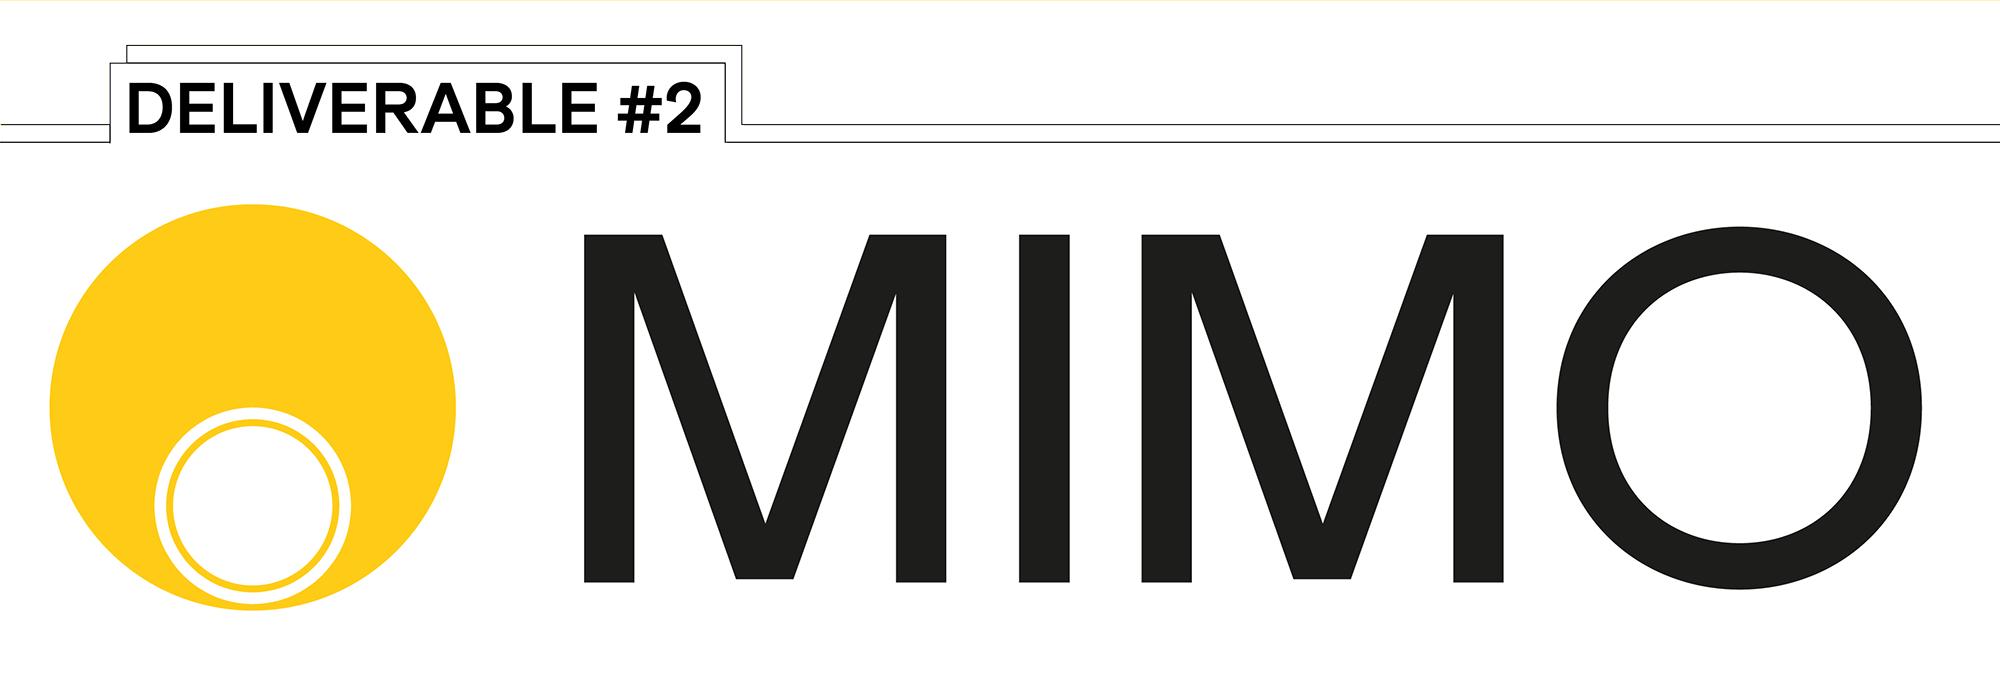 deliverable-2-sde21-mimo-3